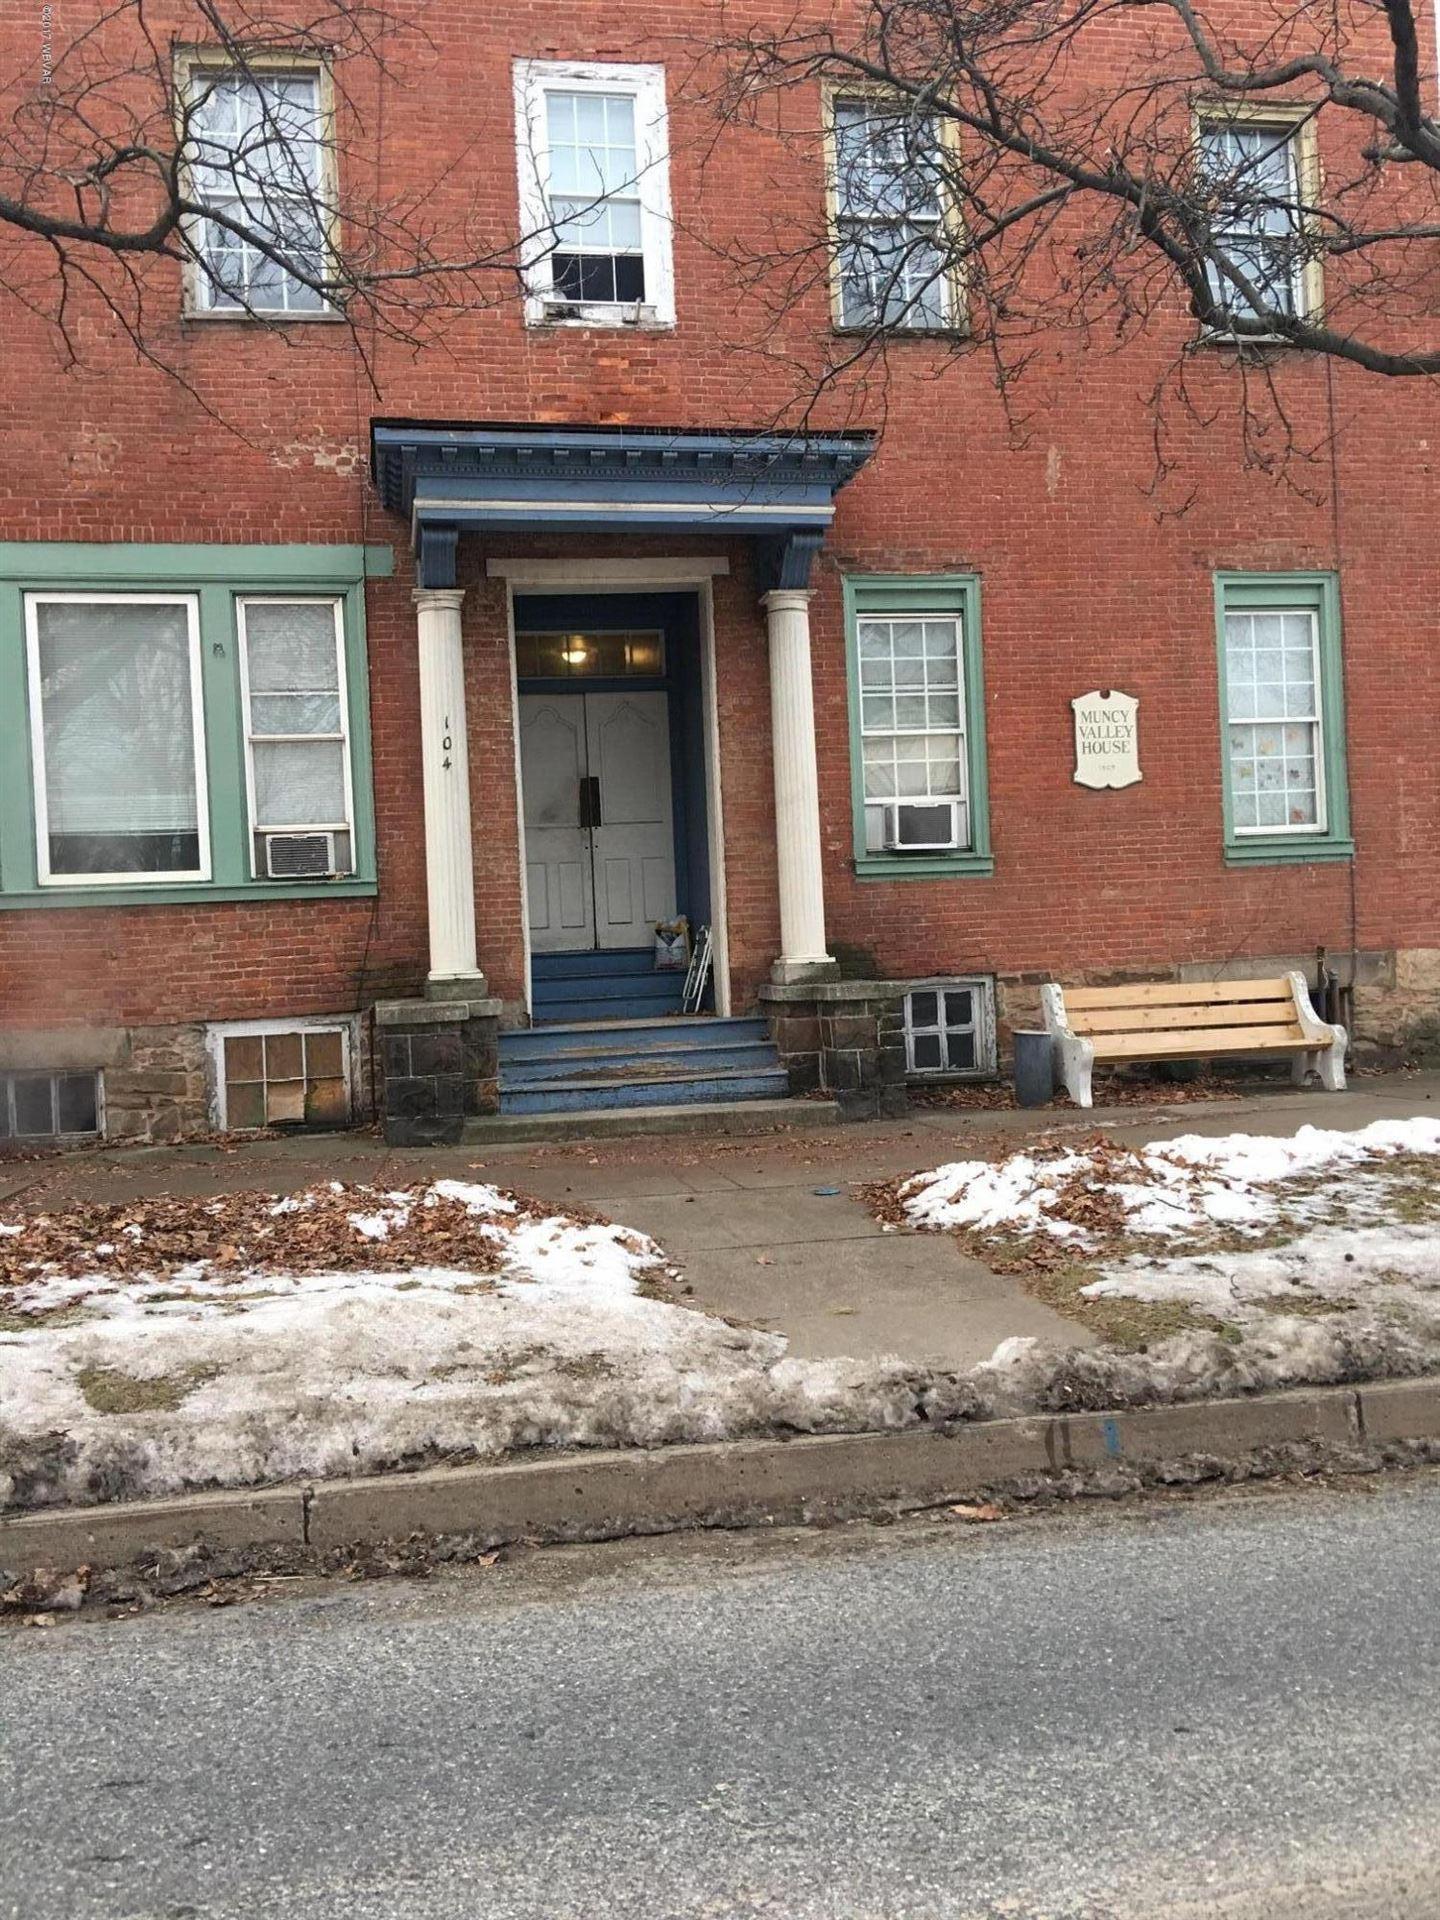 104 S MAIN STREET #APT 8, Muncy, PA 17756 - #: WB-80127